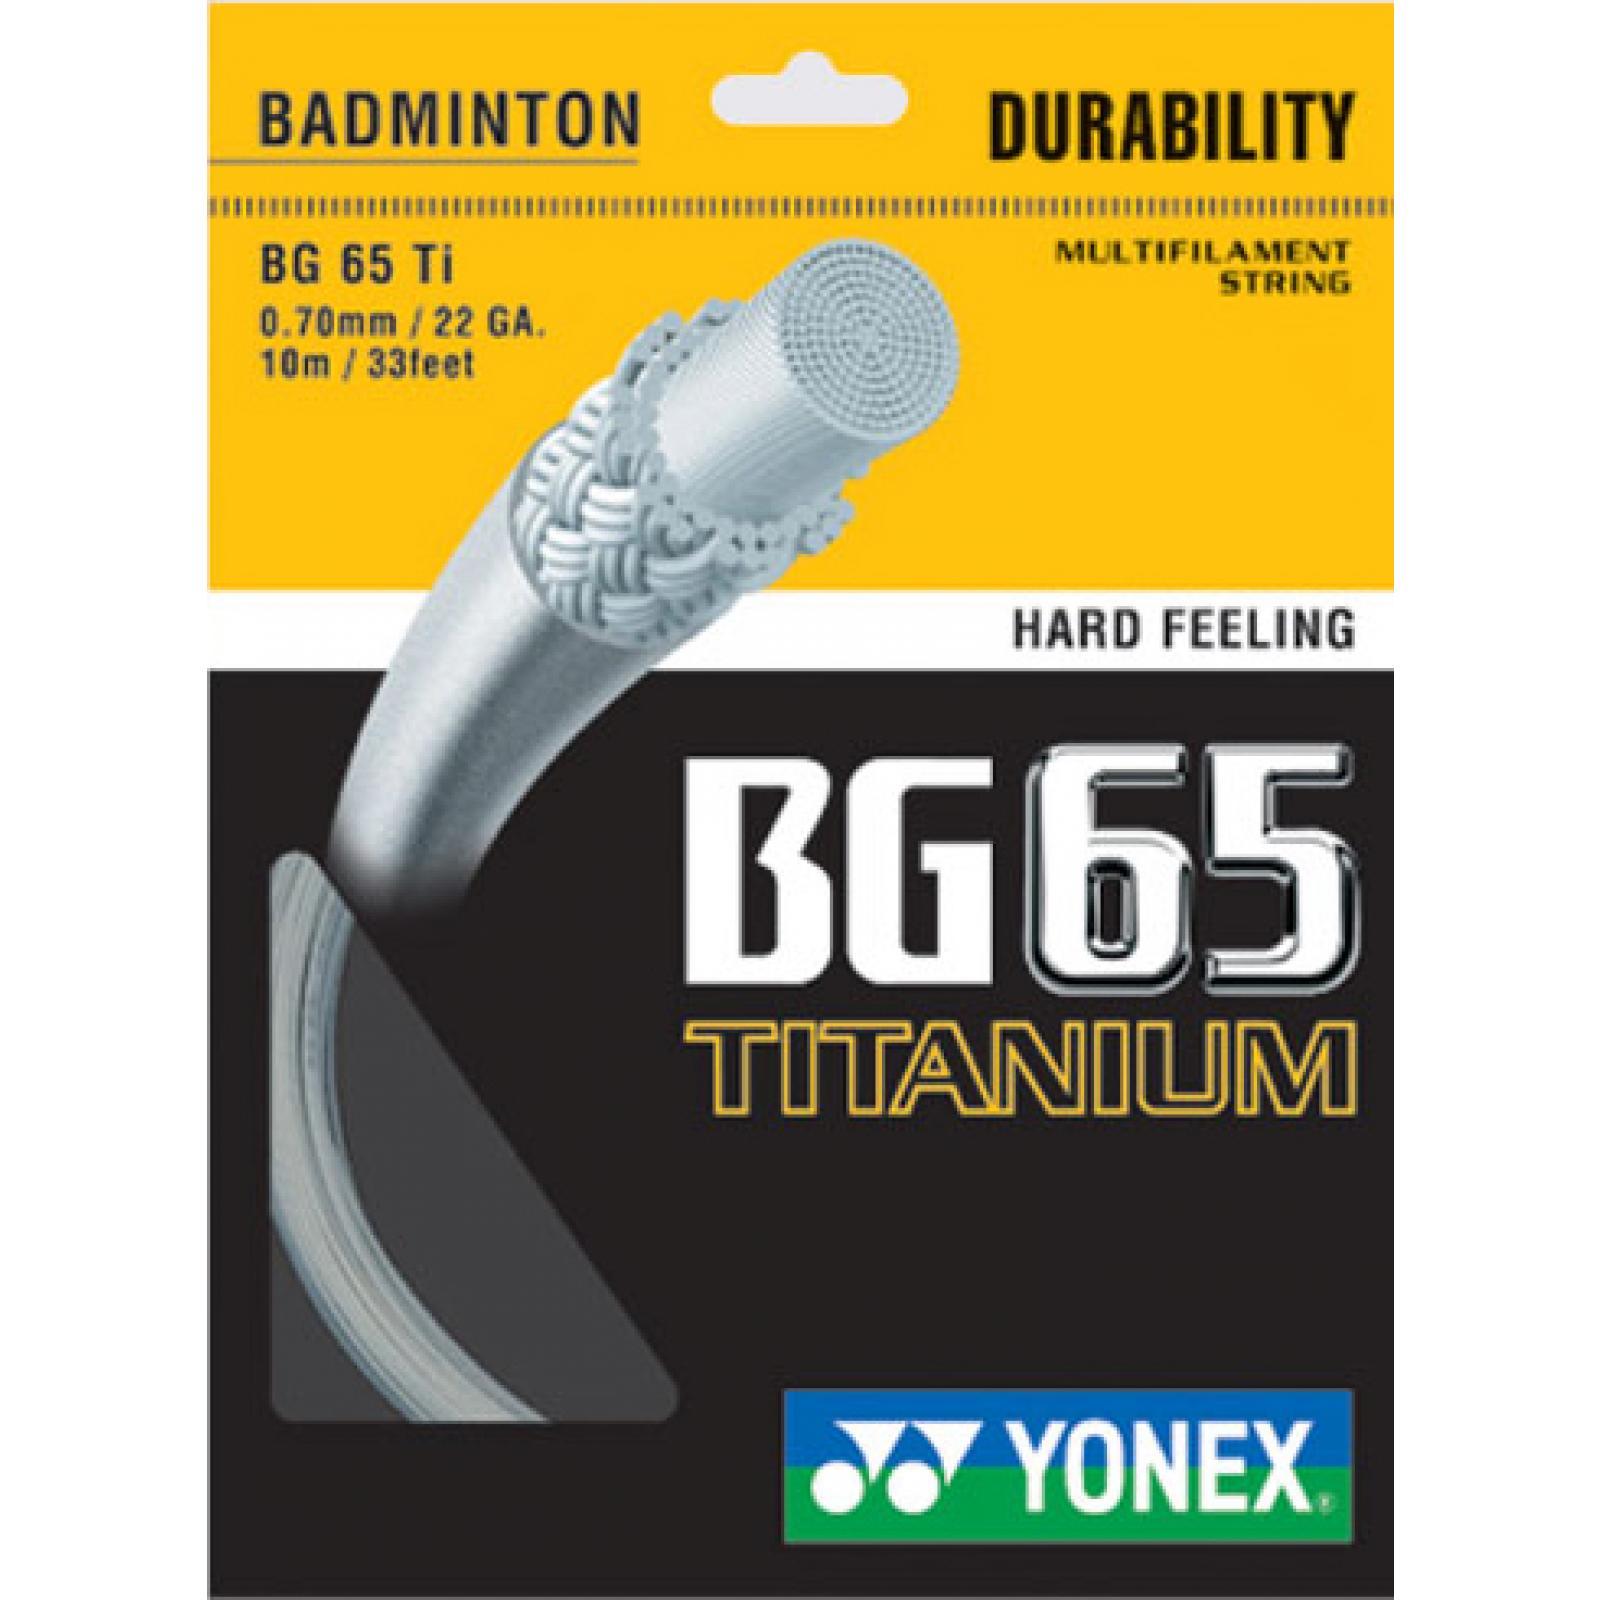 https://www.badec.store/produkty_img/badmintonovy-vyplet1571924564L.jpg